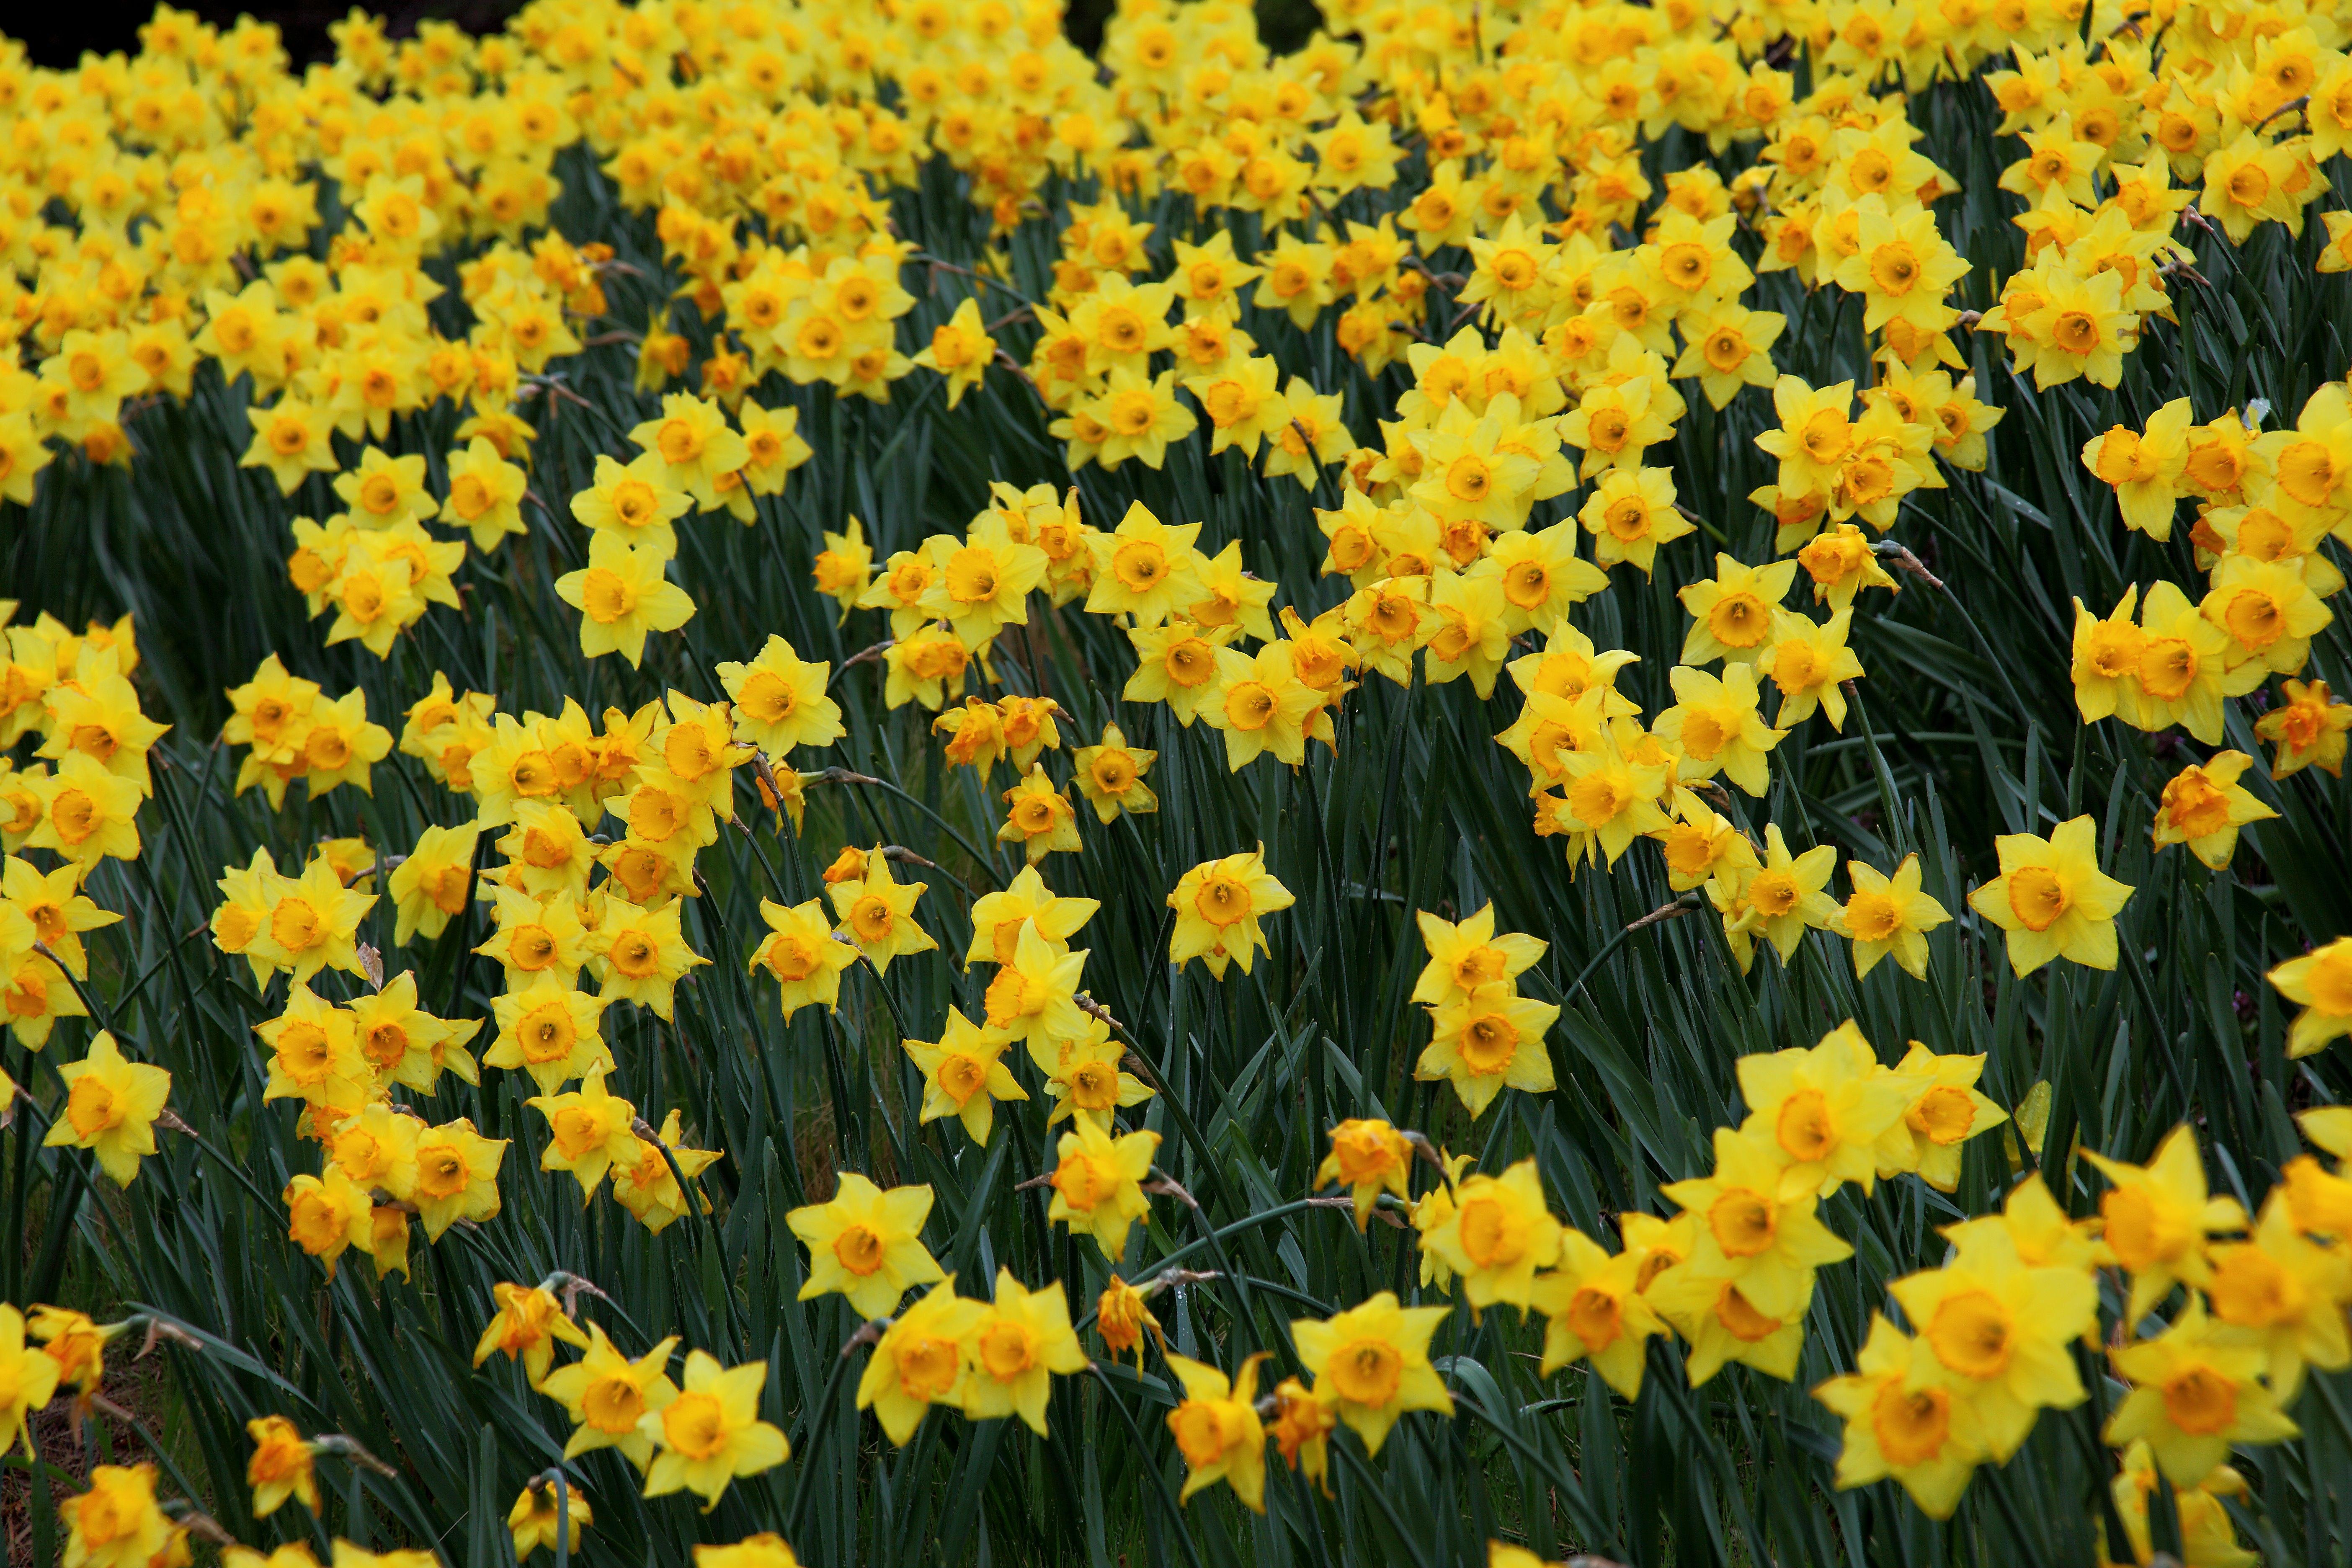 Filefield Yellow Daffodil Flowers West Virginia Forestwander